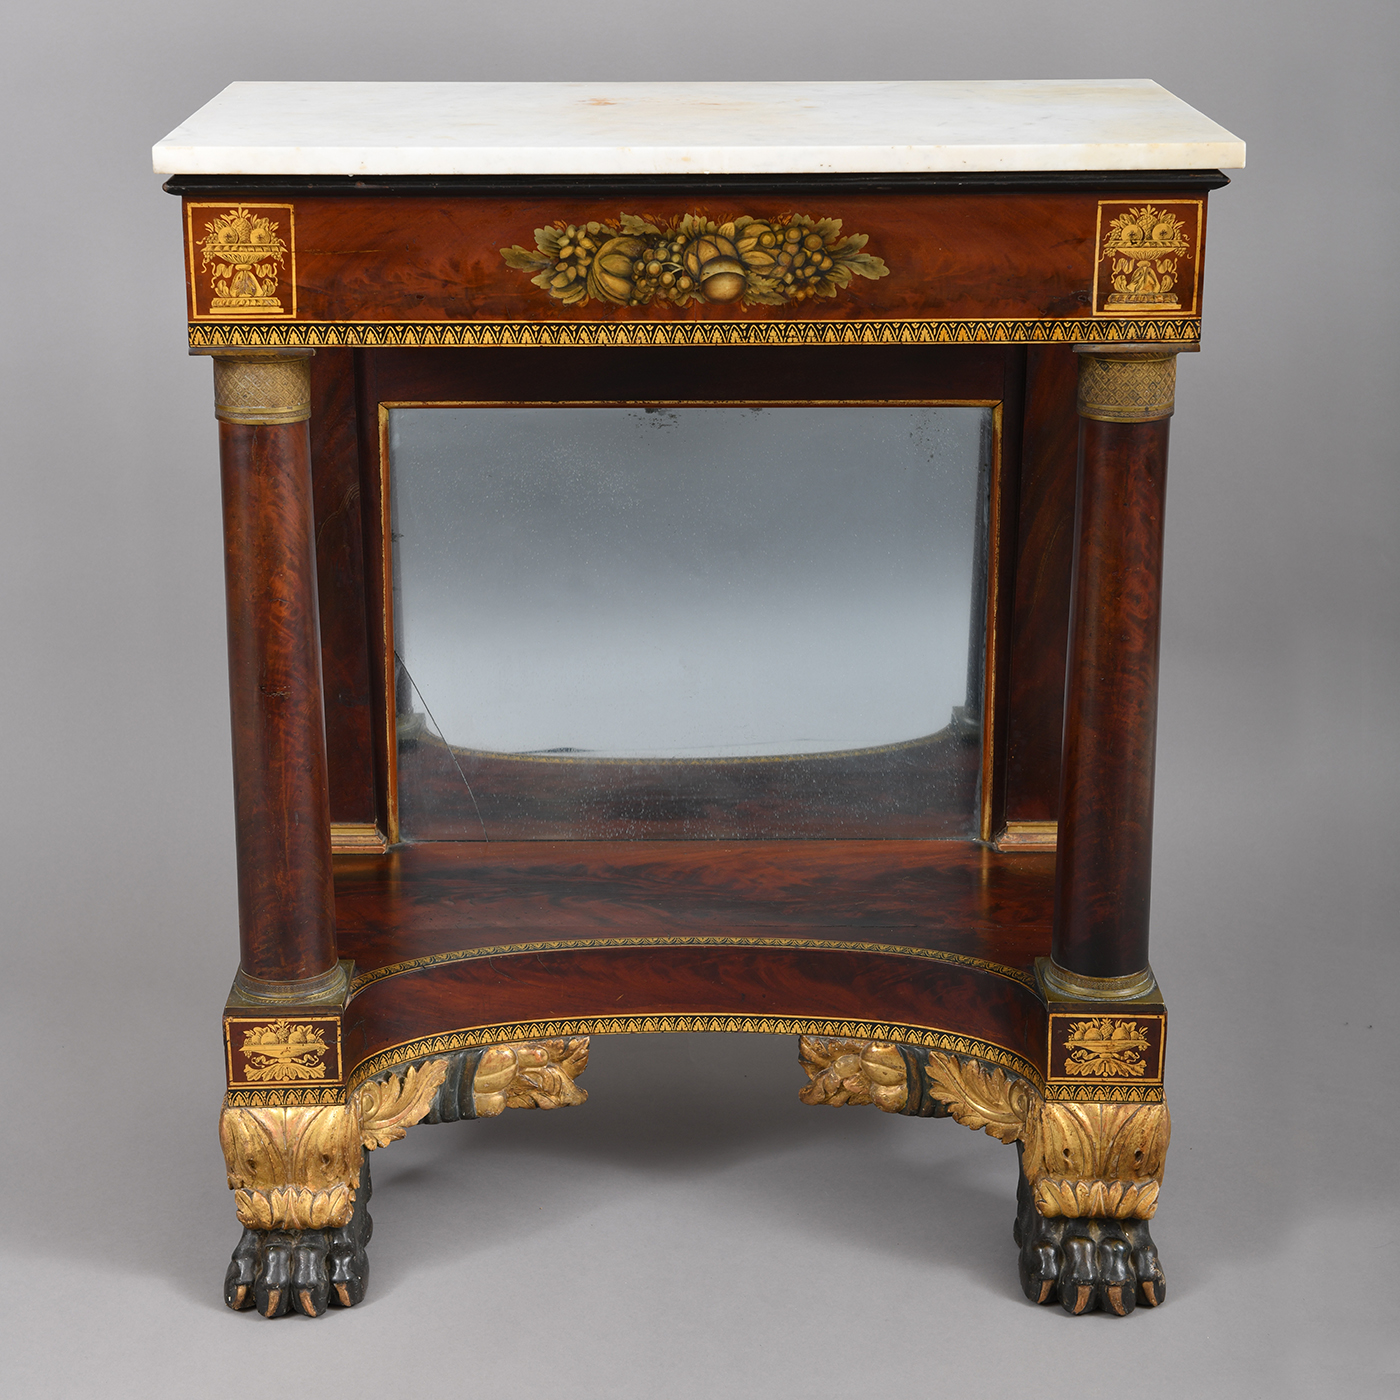 A Rare Diminutive Size Classical Pier Table Jeffrey